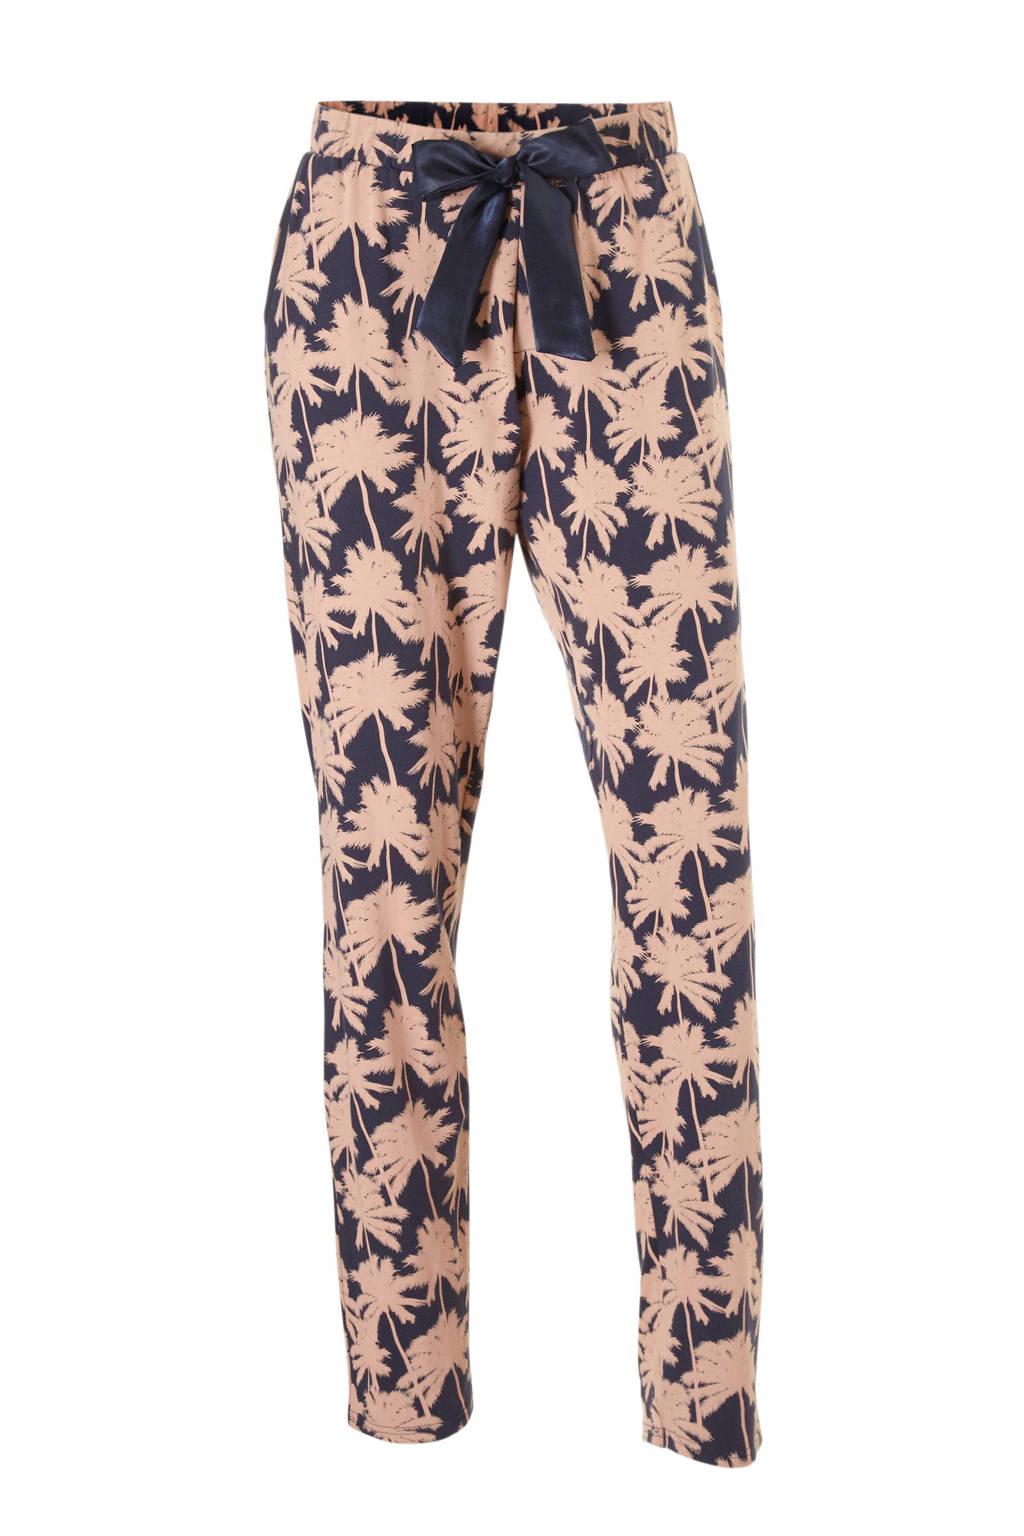 Charlie Choe pyjamabroek met all over print donkerblauw/roze, Donkerblauw/licht zalm